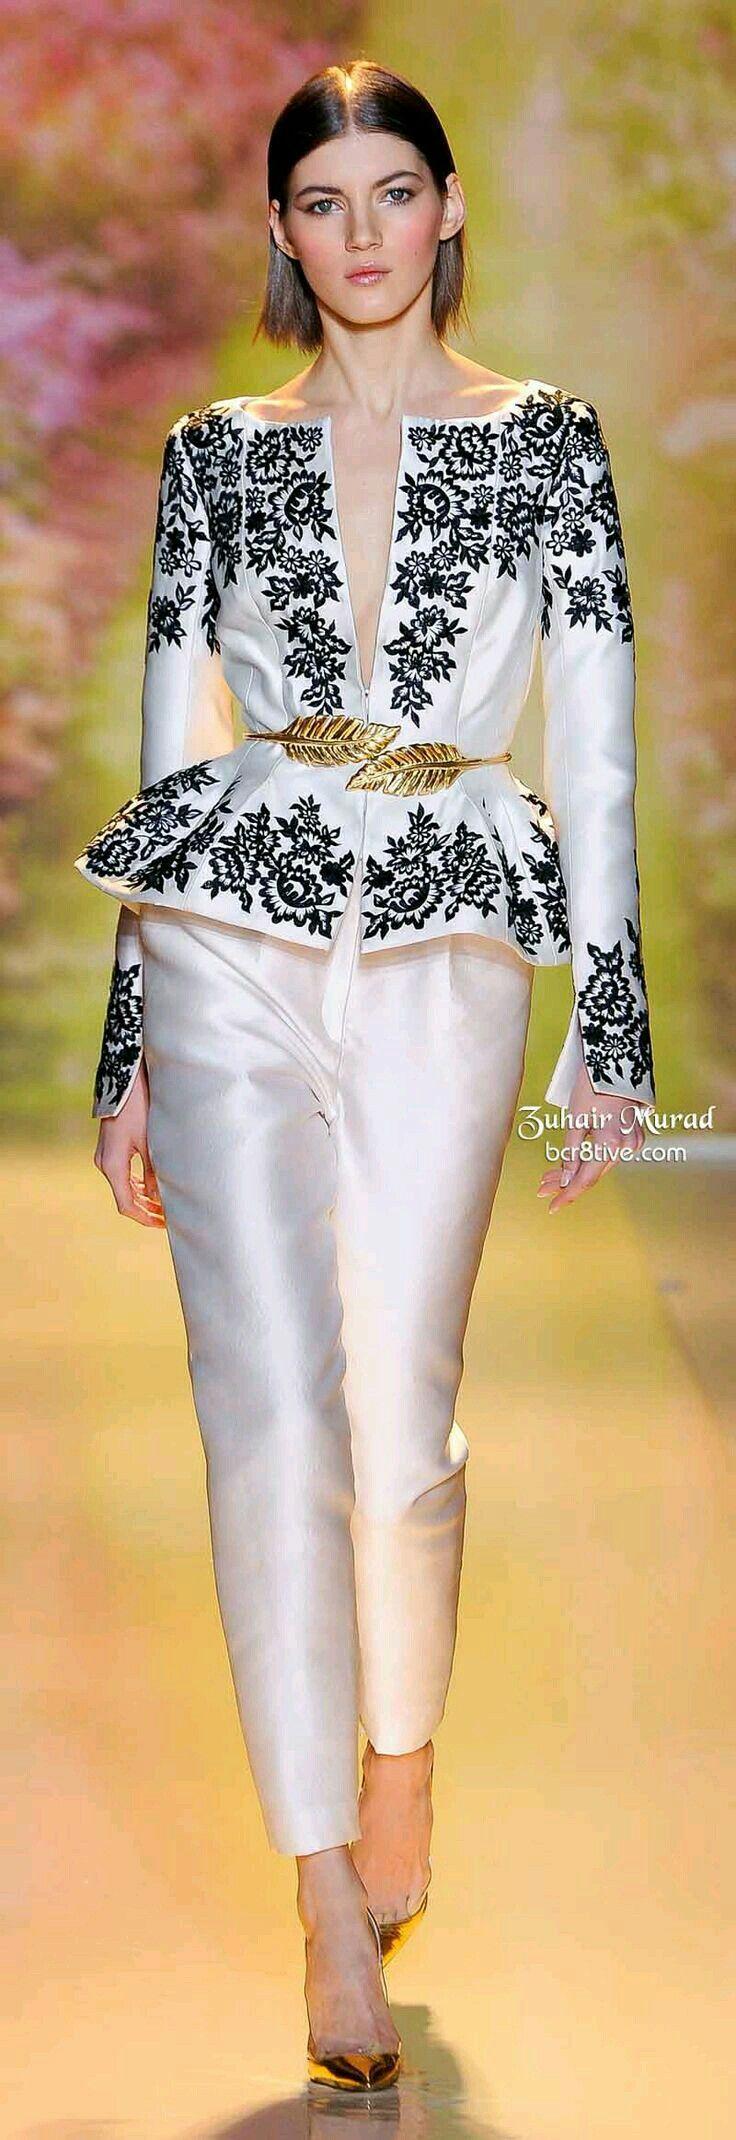 pingl par bilge sur moda pinterest karakou traditionnel et tenue. Black Bedroom Furniture Sets. Home Design Ideas